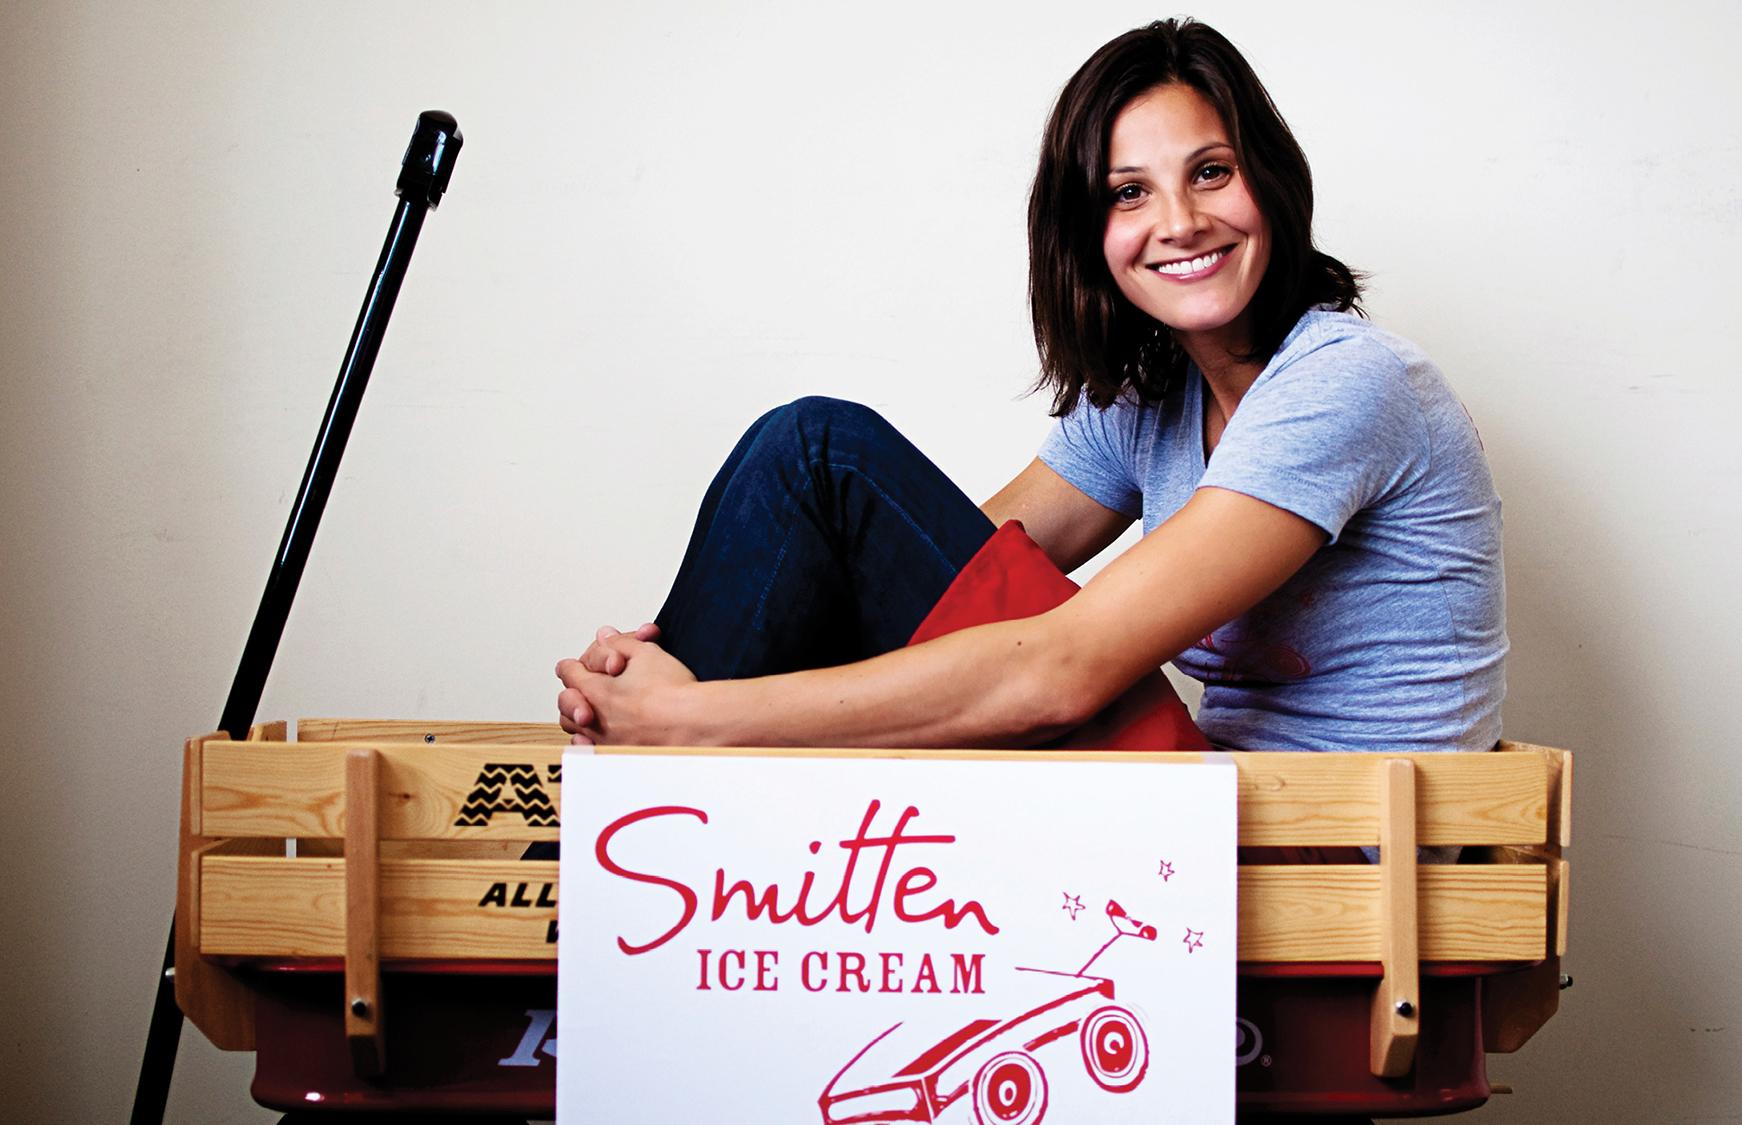 Smitten Ice Cream an interview with the founder of smitten ice cream | career contessa